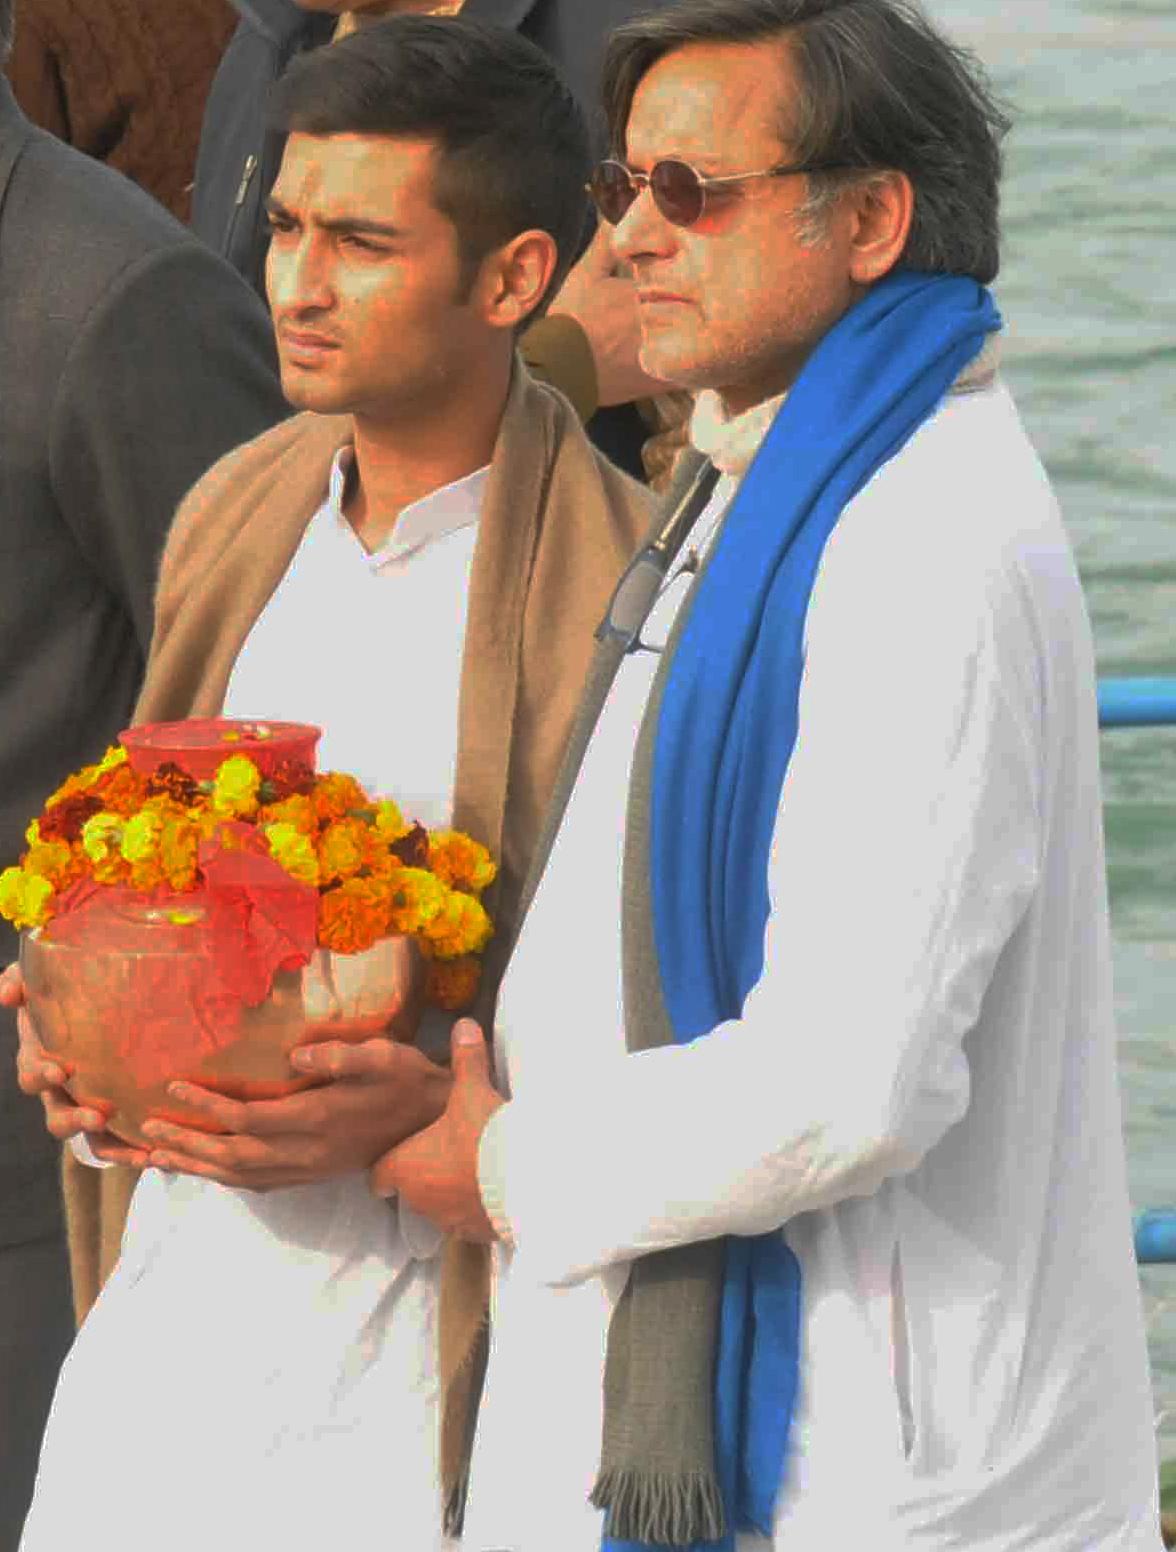 Sunanda Pushkar's husband and Union minister Shashi Tharoor and son Shiv Menon at Haridwar on Monday. 200114. Express archive Photo.